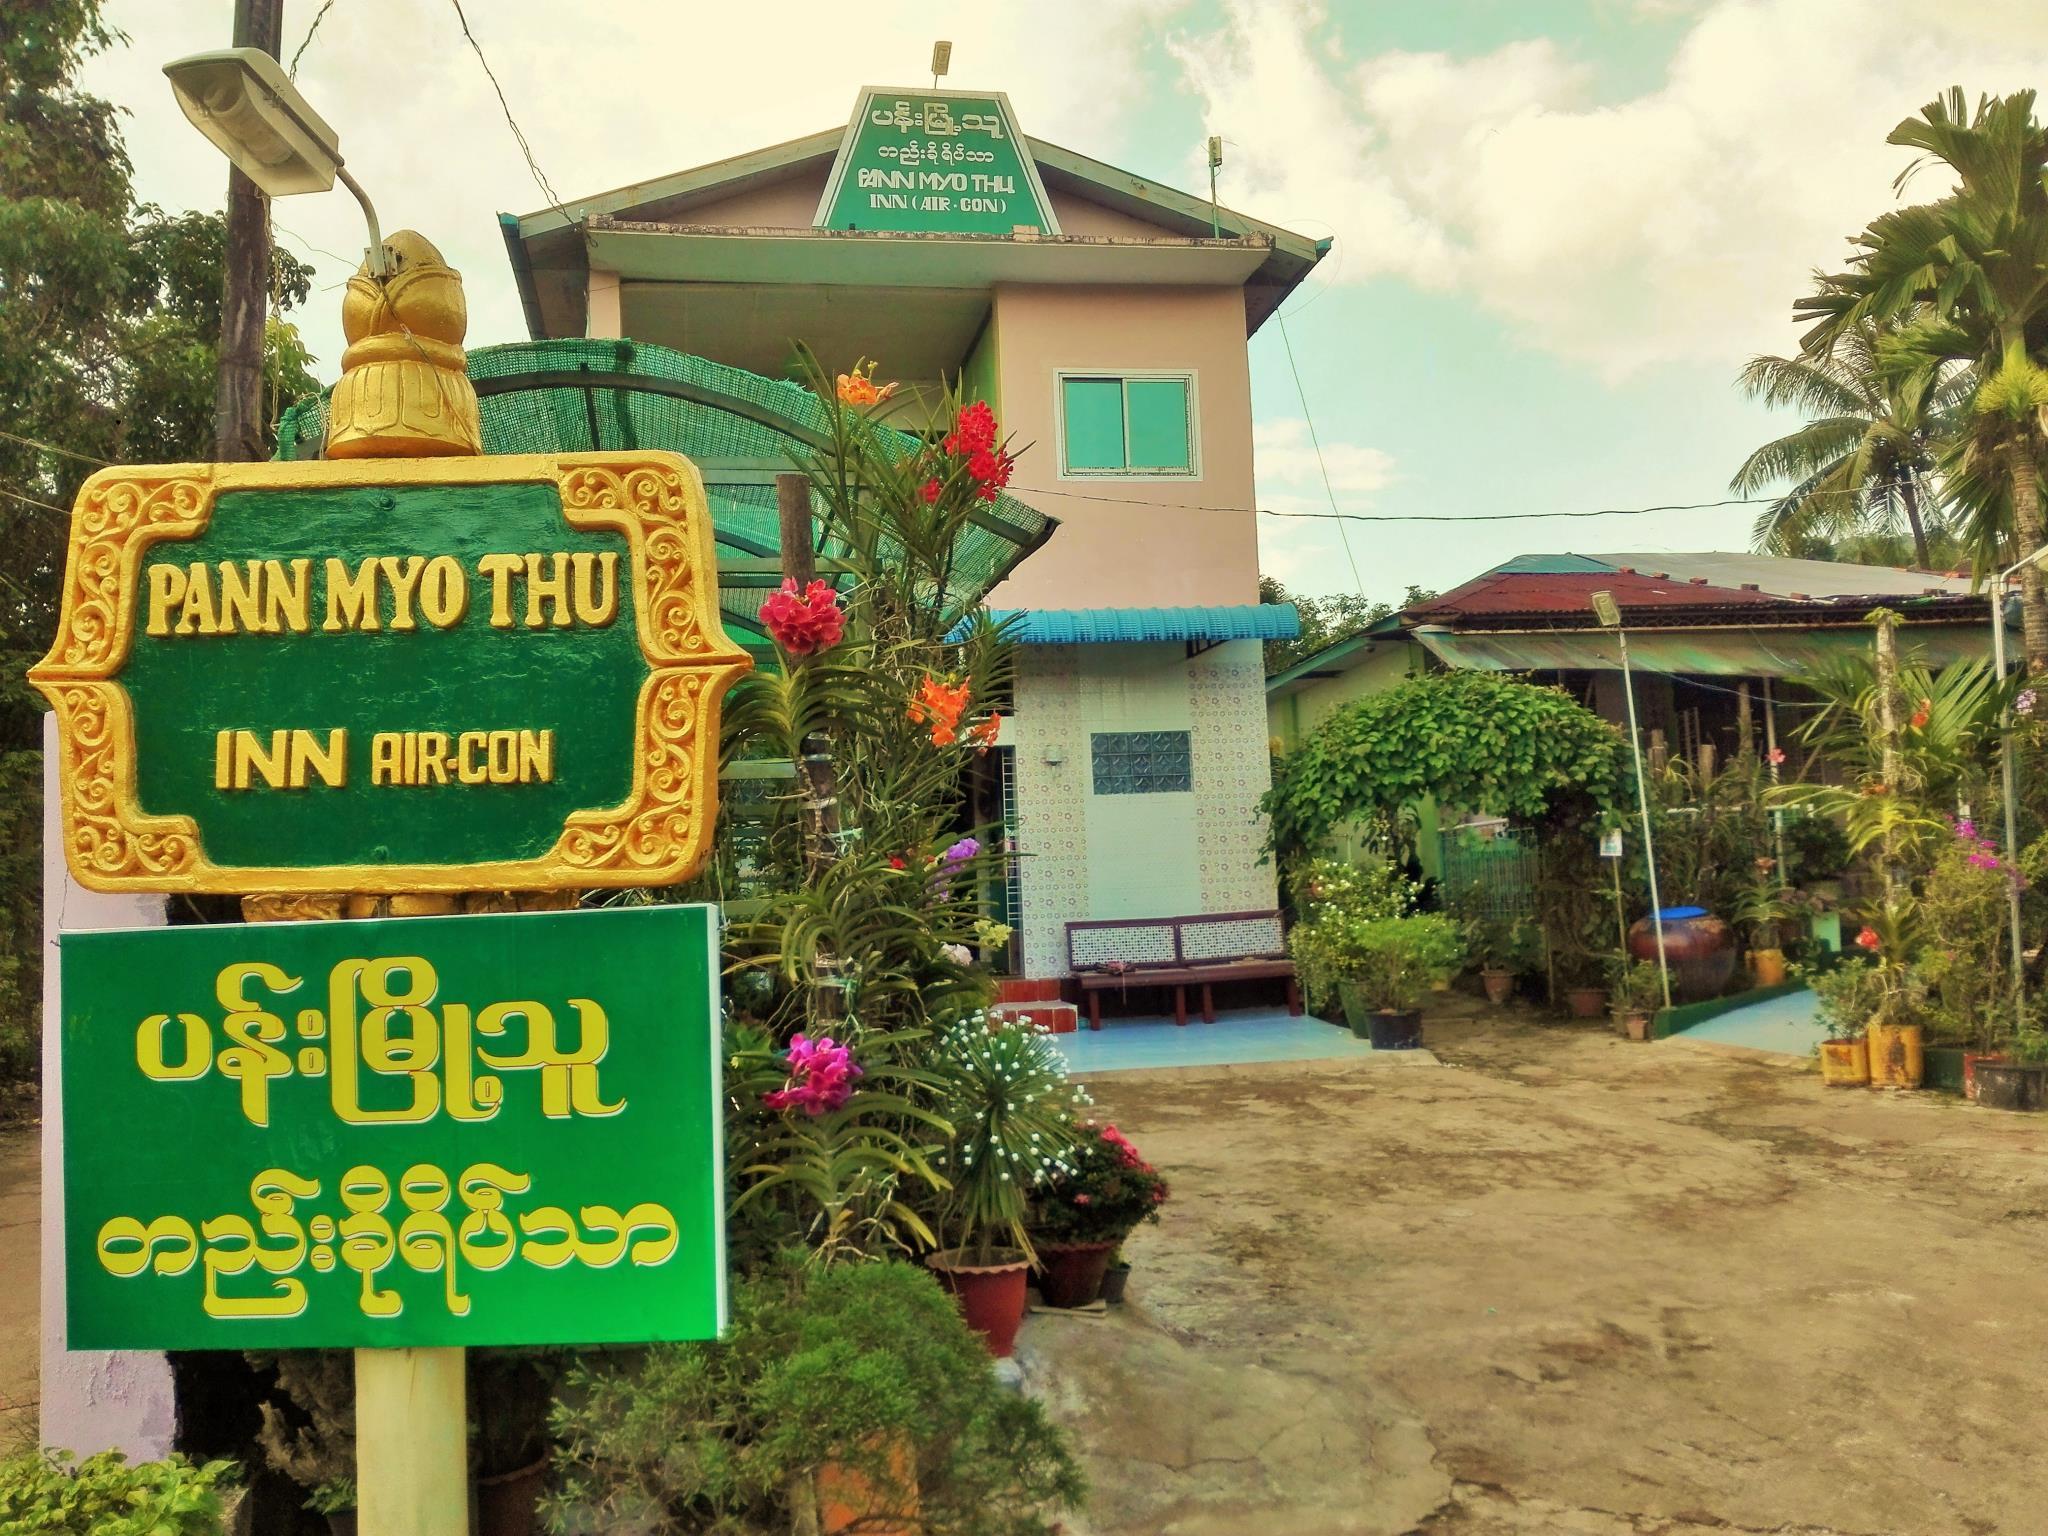 Pann Myo Thu GuestHouse